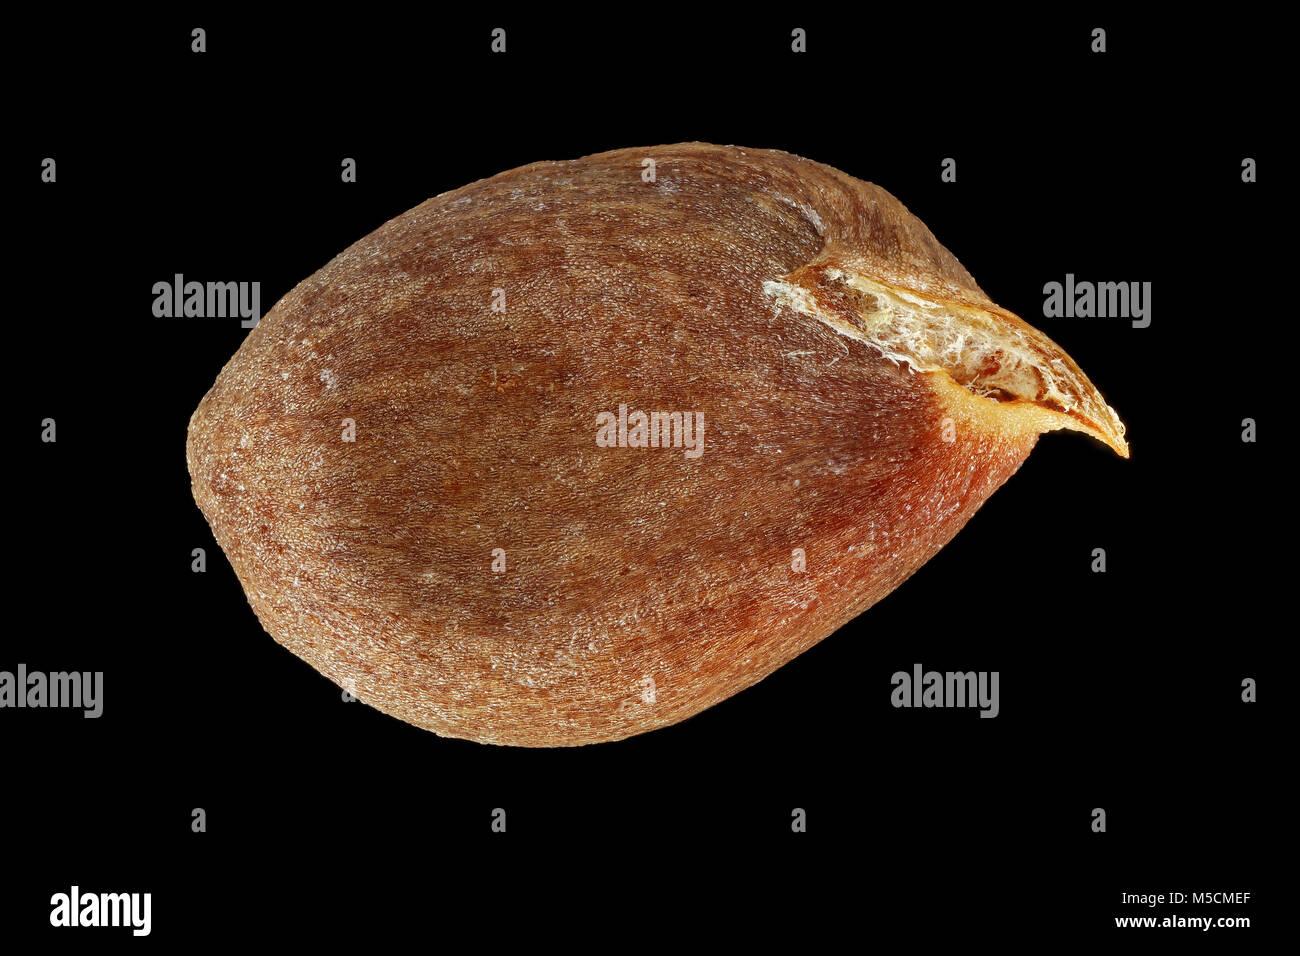 Malus Domestica, Apfelbaum, Kultur-Apfelbaum, Samen, Nahaufnahme, Saatgröße 7-10 mm Stockbild